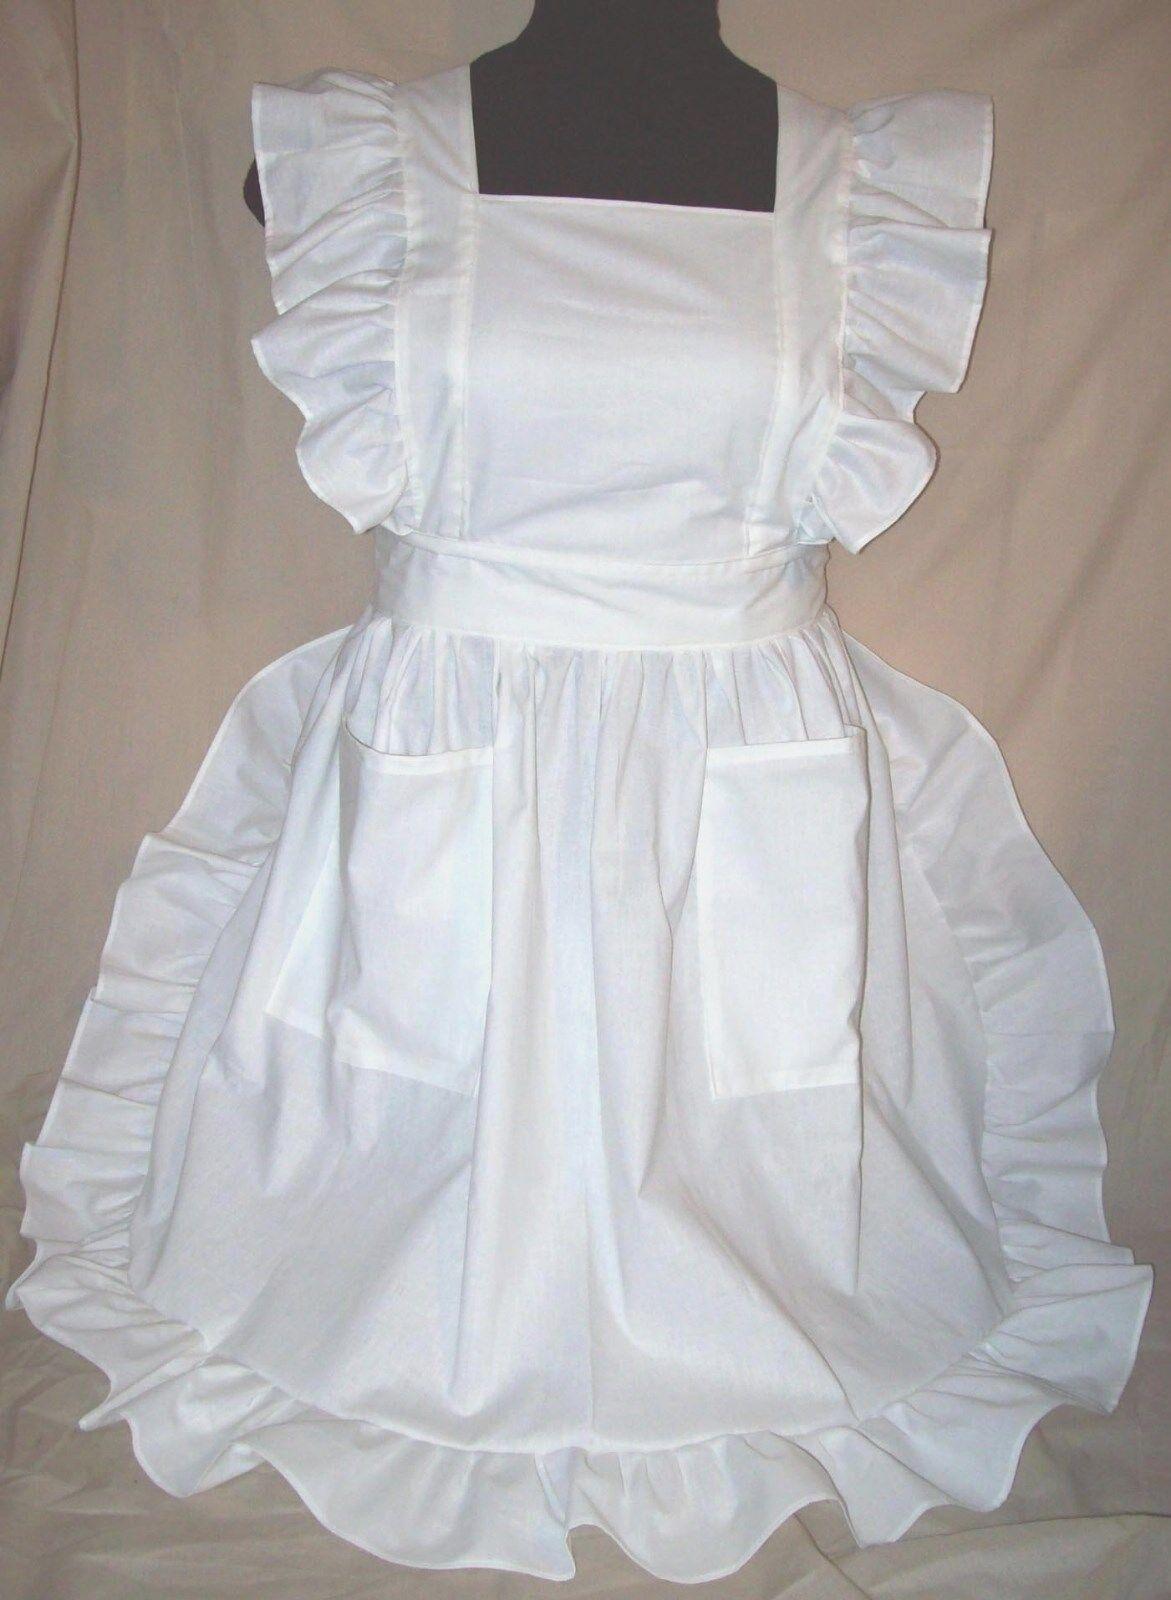 White pinafore apron ebay - Plus Size 1x Ruffled Bib Apron Pinafore New